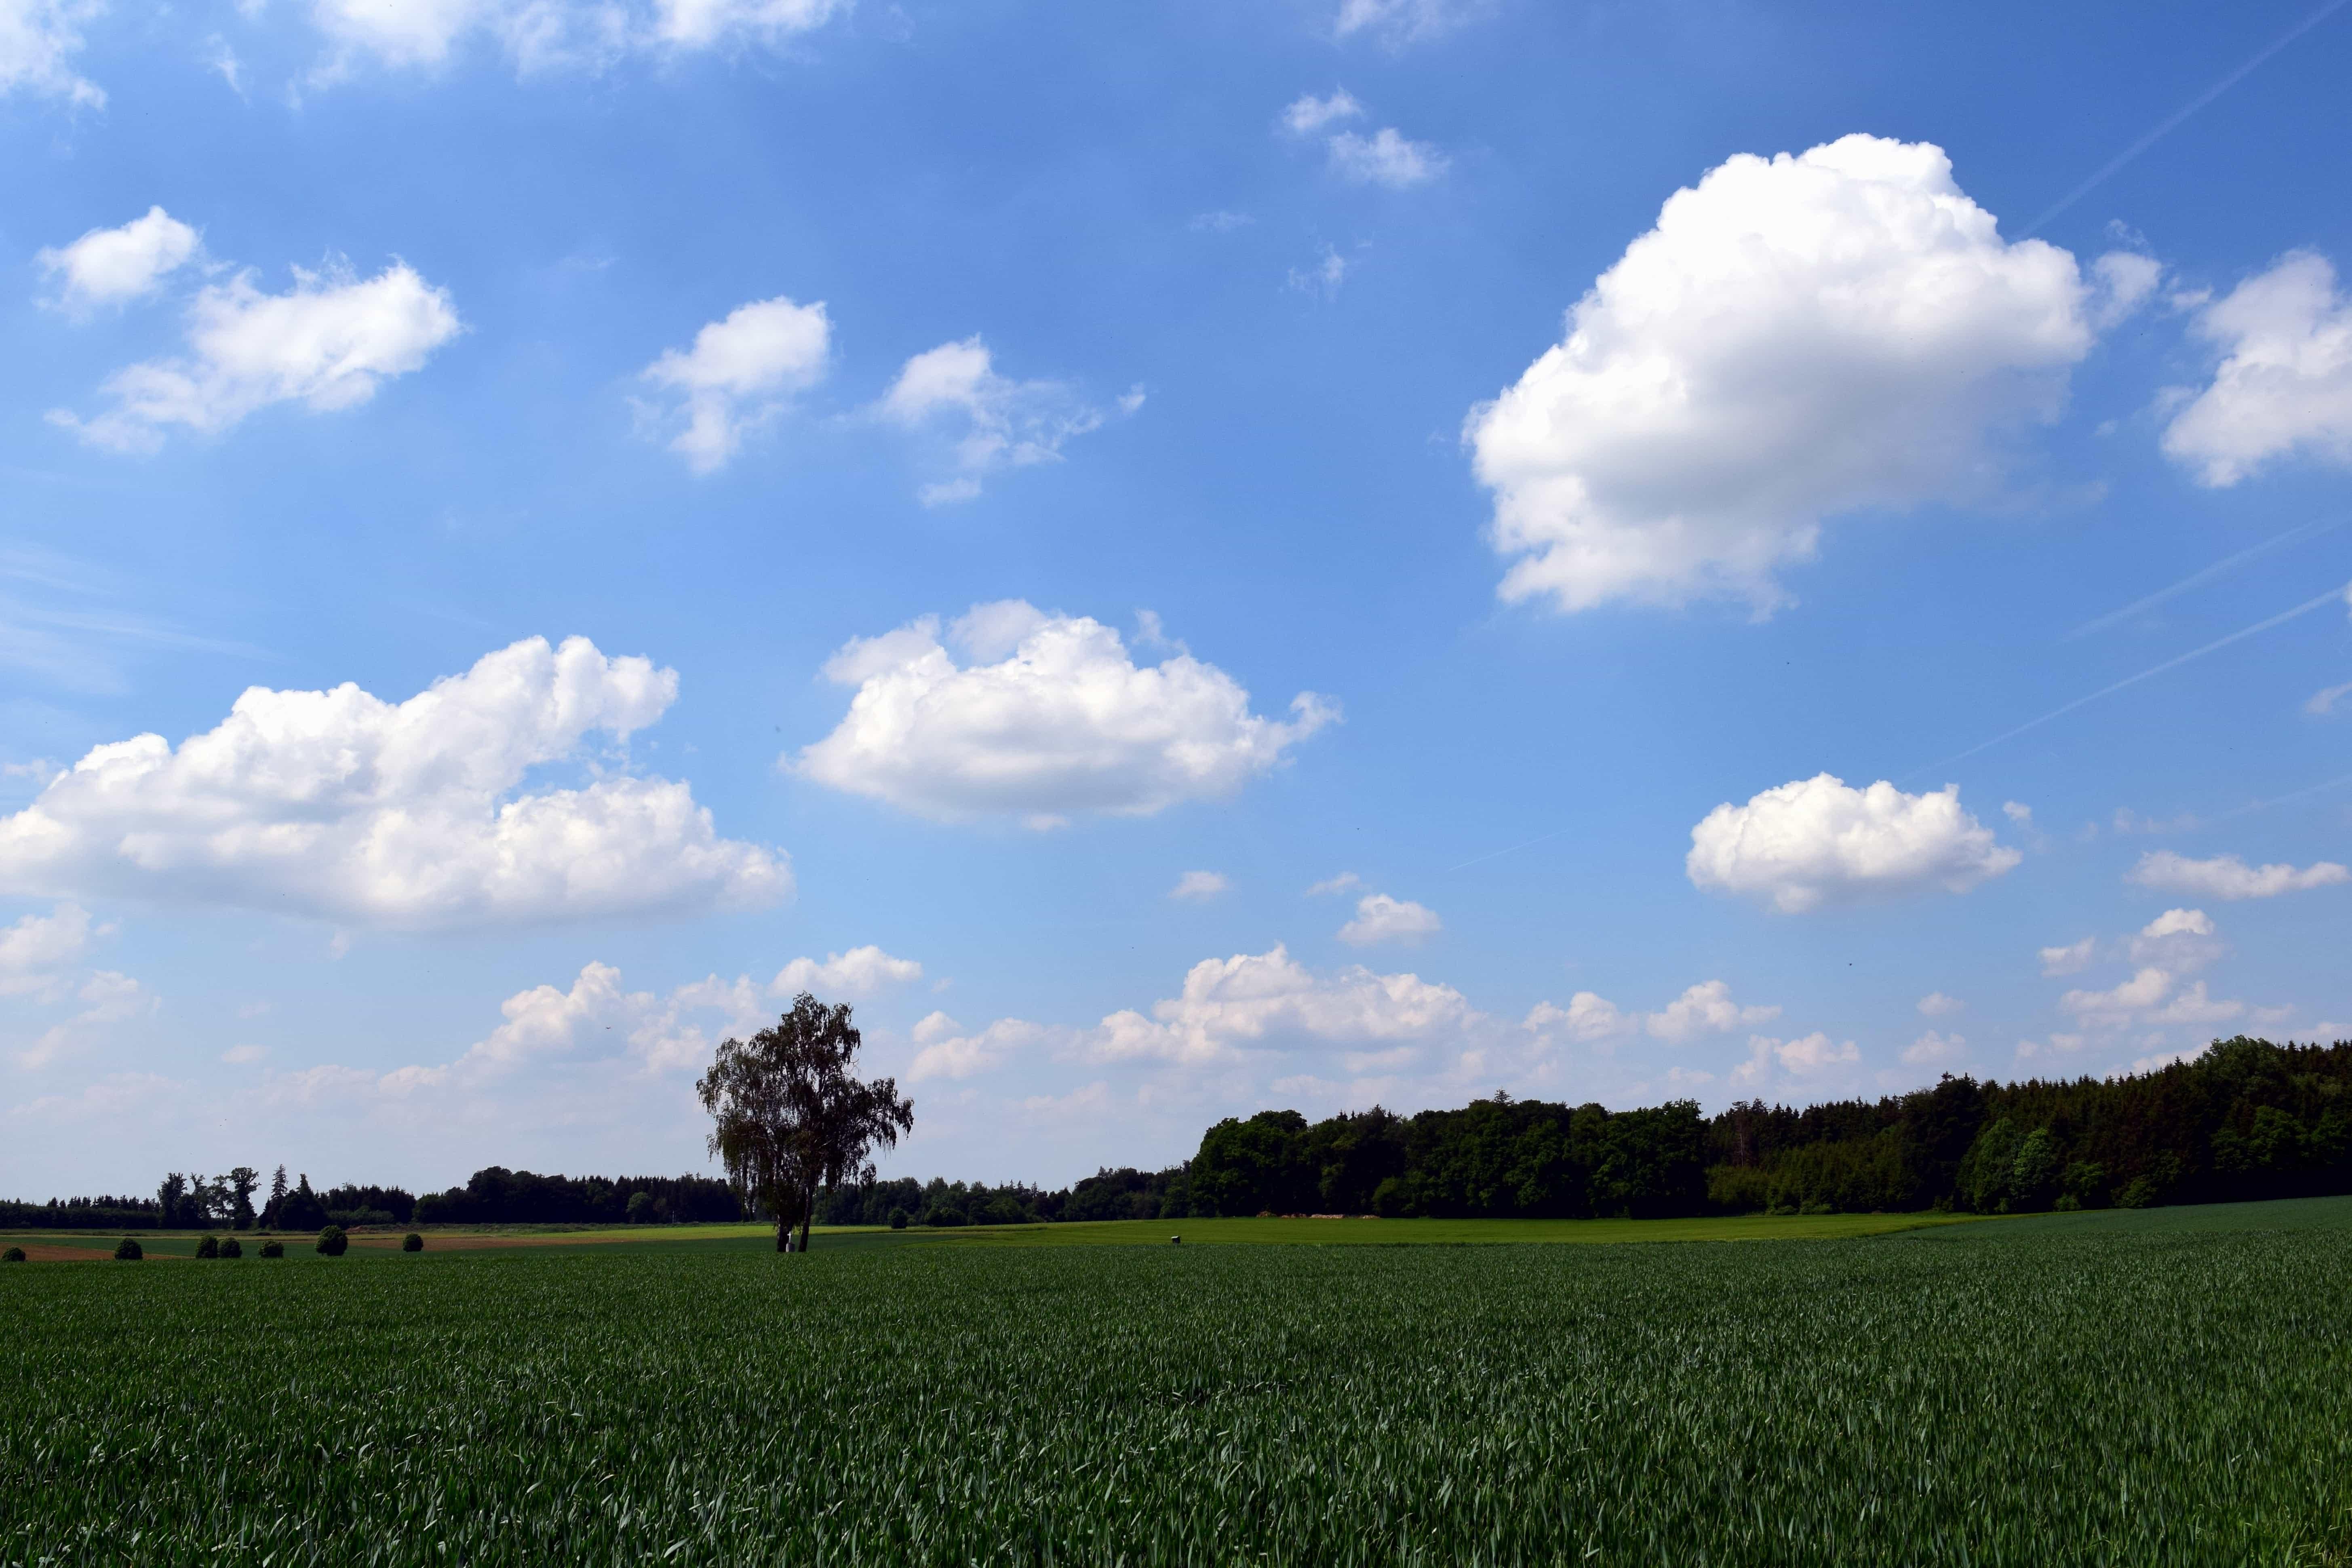 Farm, Landscape, Blue Sky, Tree, Nature, Grass, Field, Agriculture